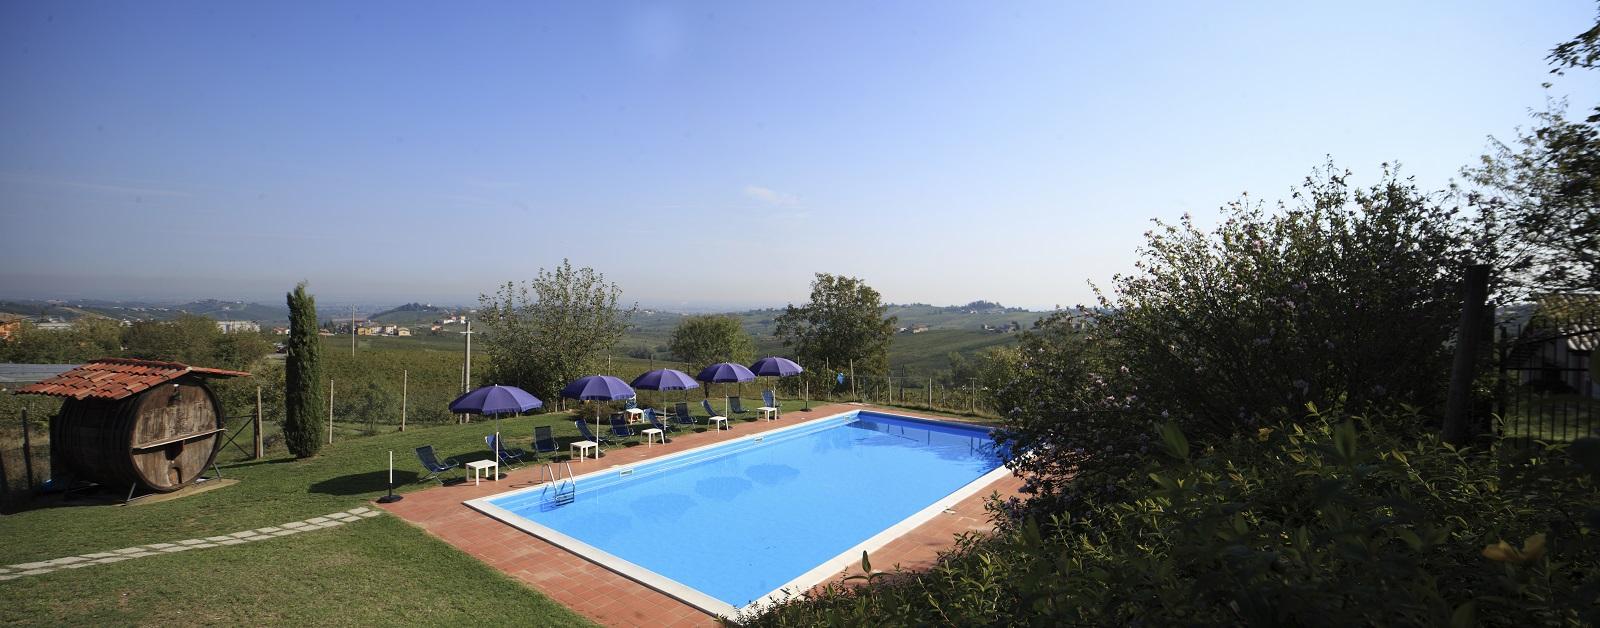 Agriturismo con piscina sulle colline di piacenza - Agriturismo piscina lombardia ...